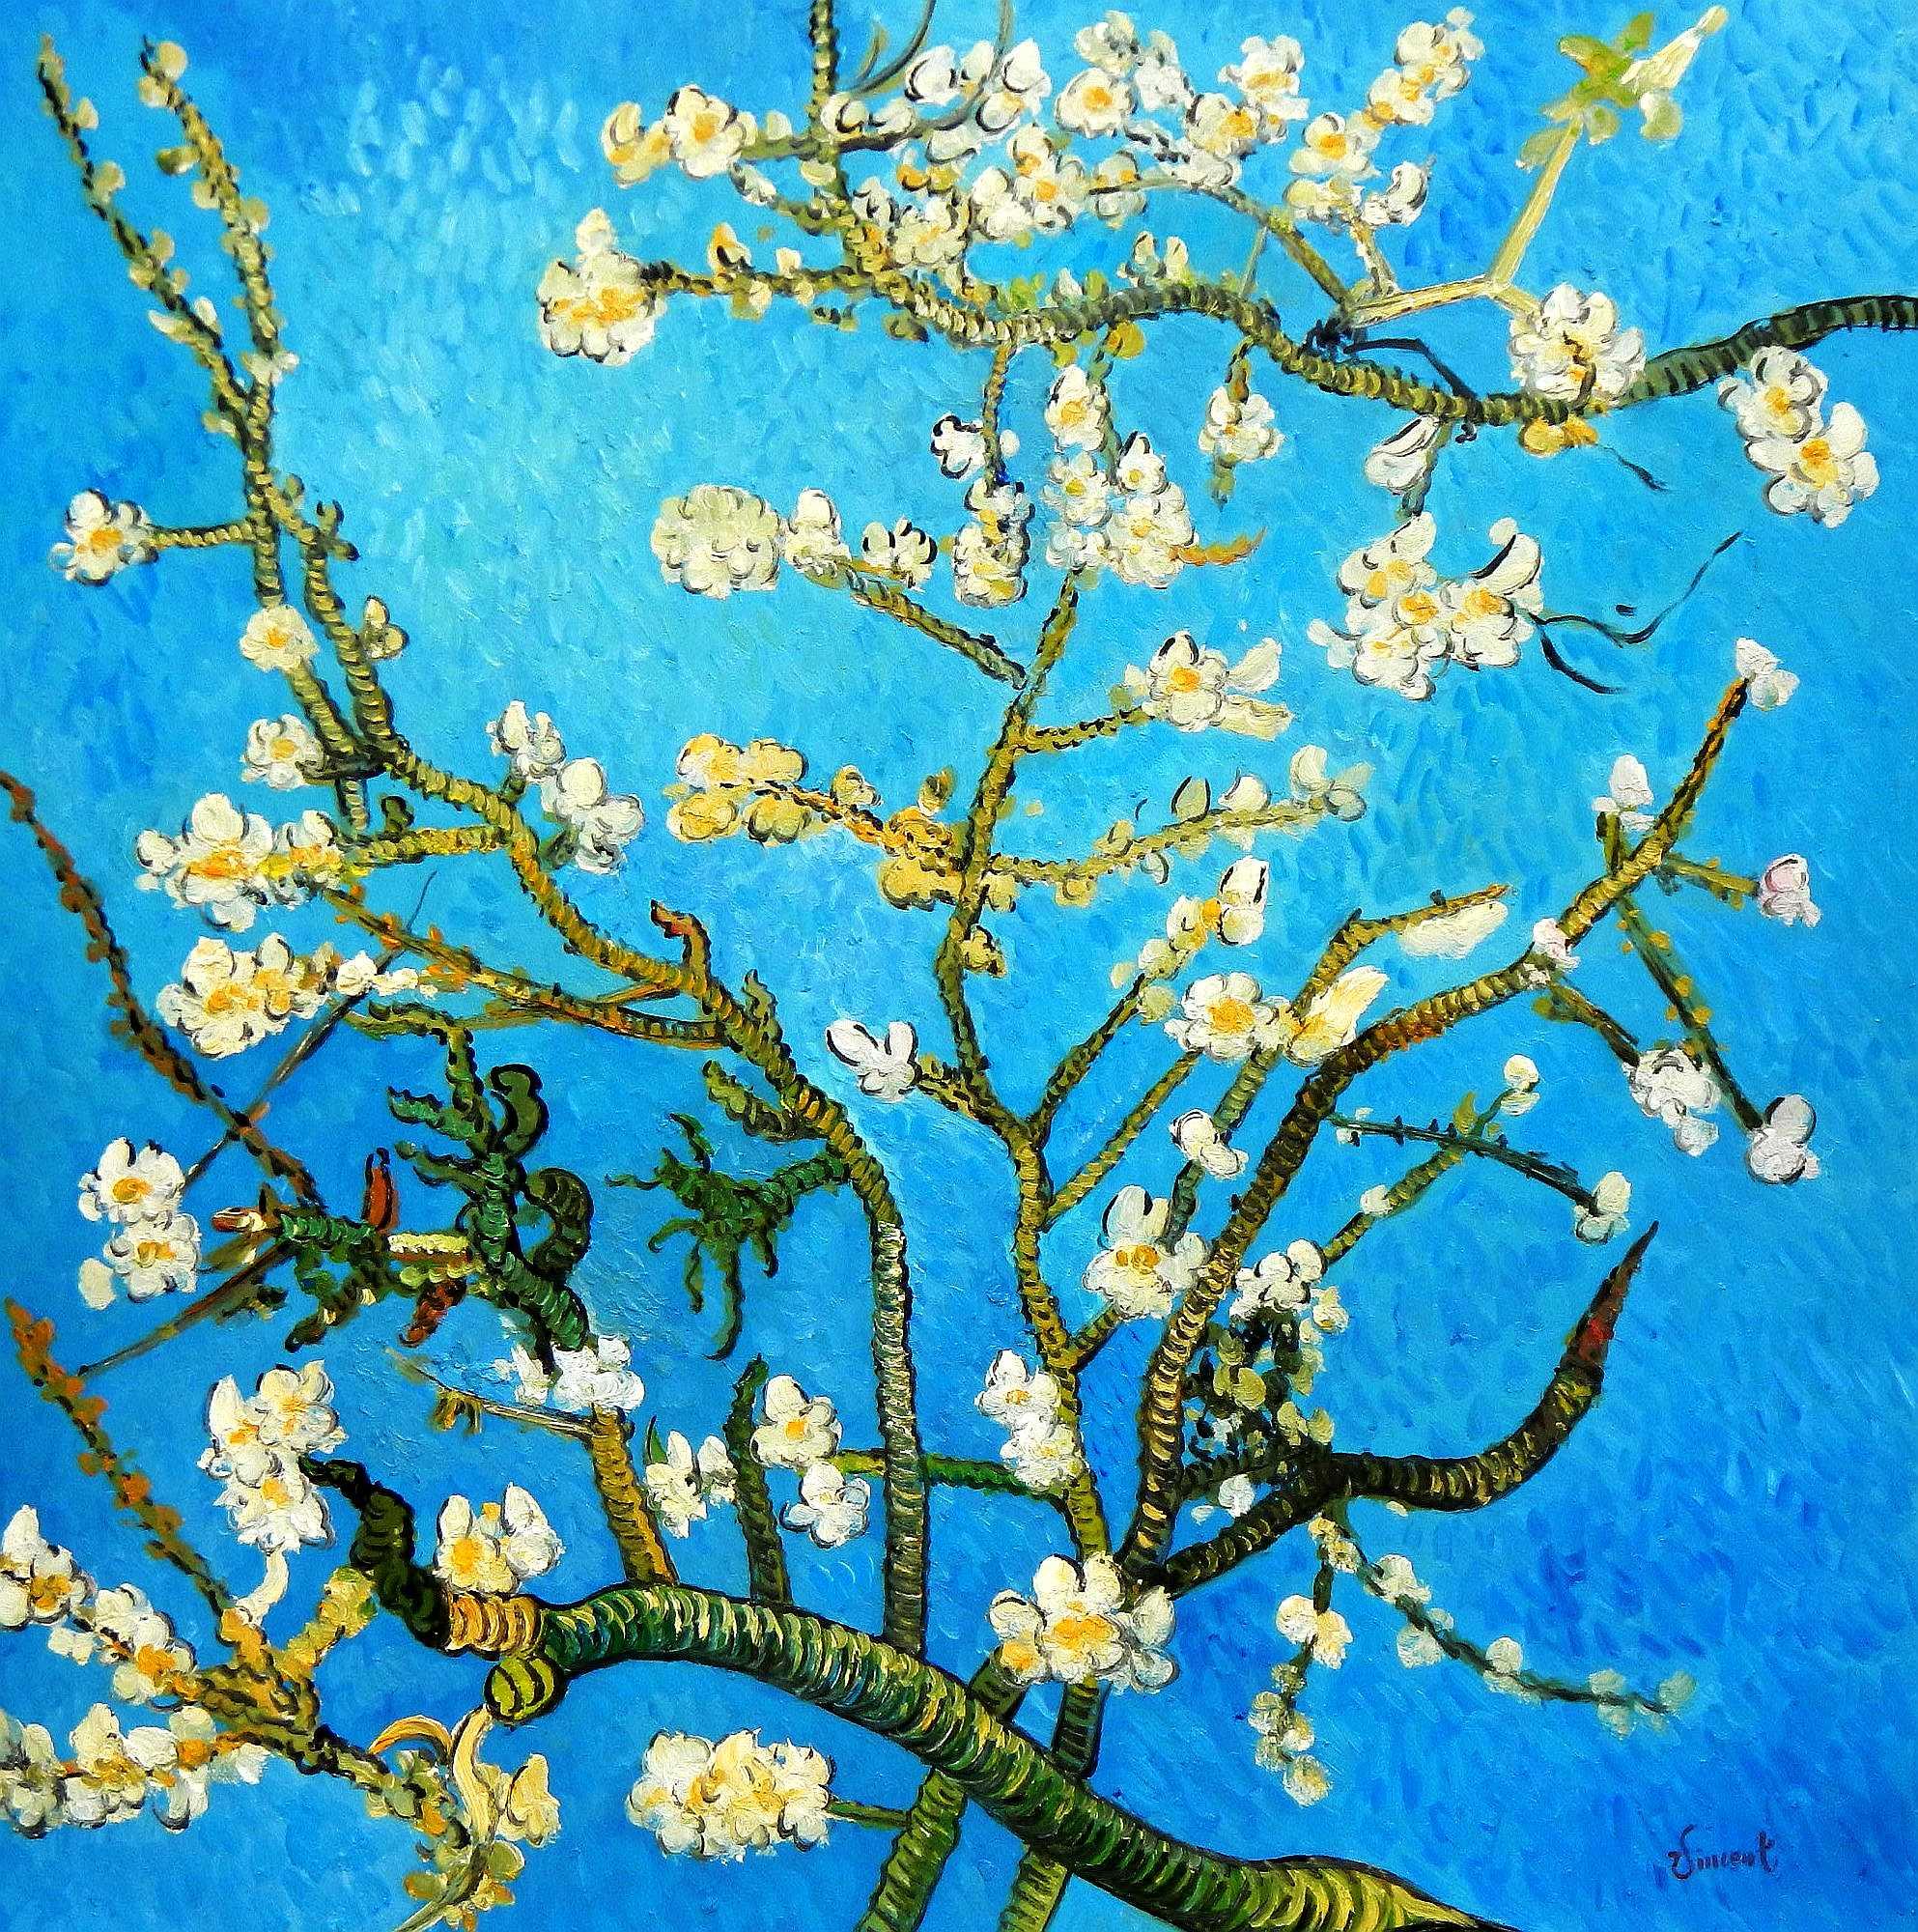 Vincent van Gogh - Äste mit Mandelblüten m95958 120x120cm Ölbild handgemalt